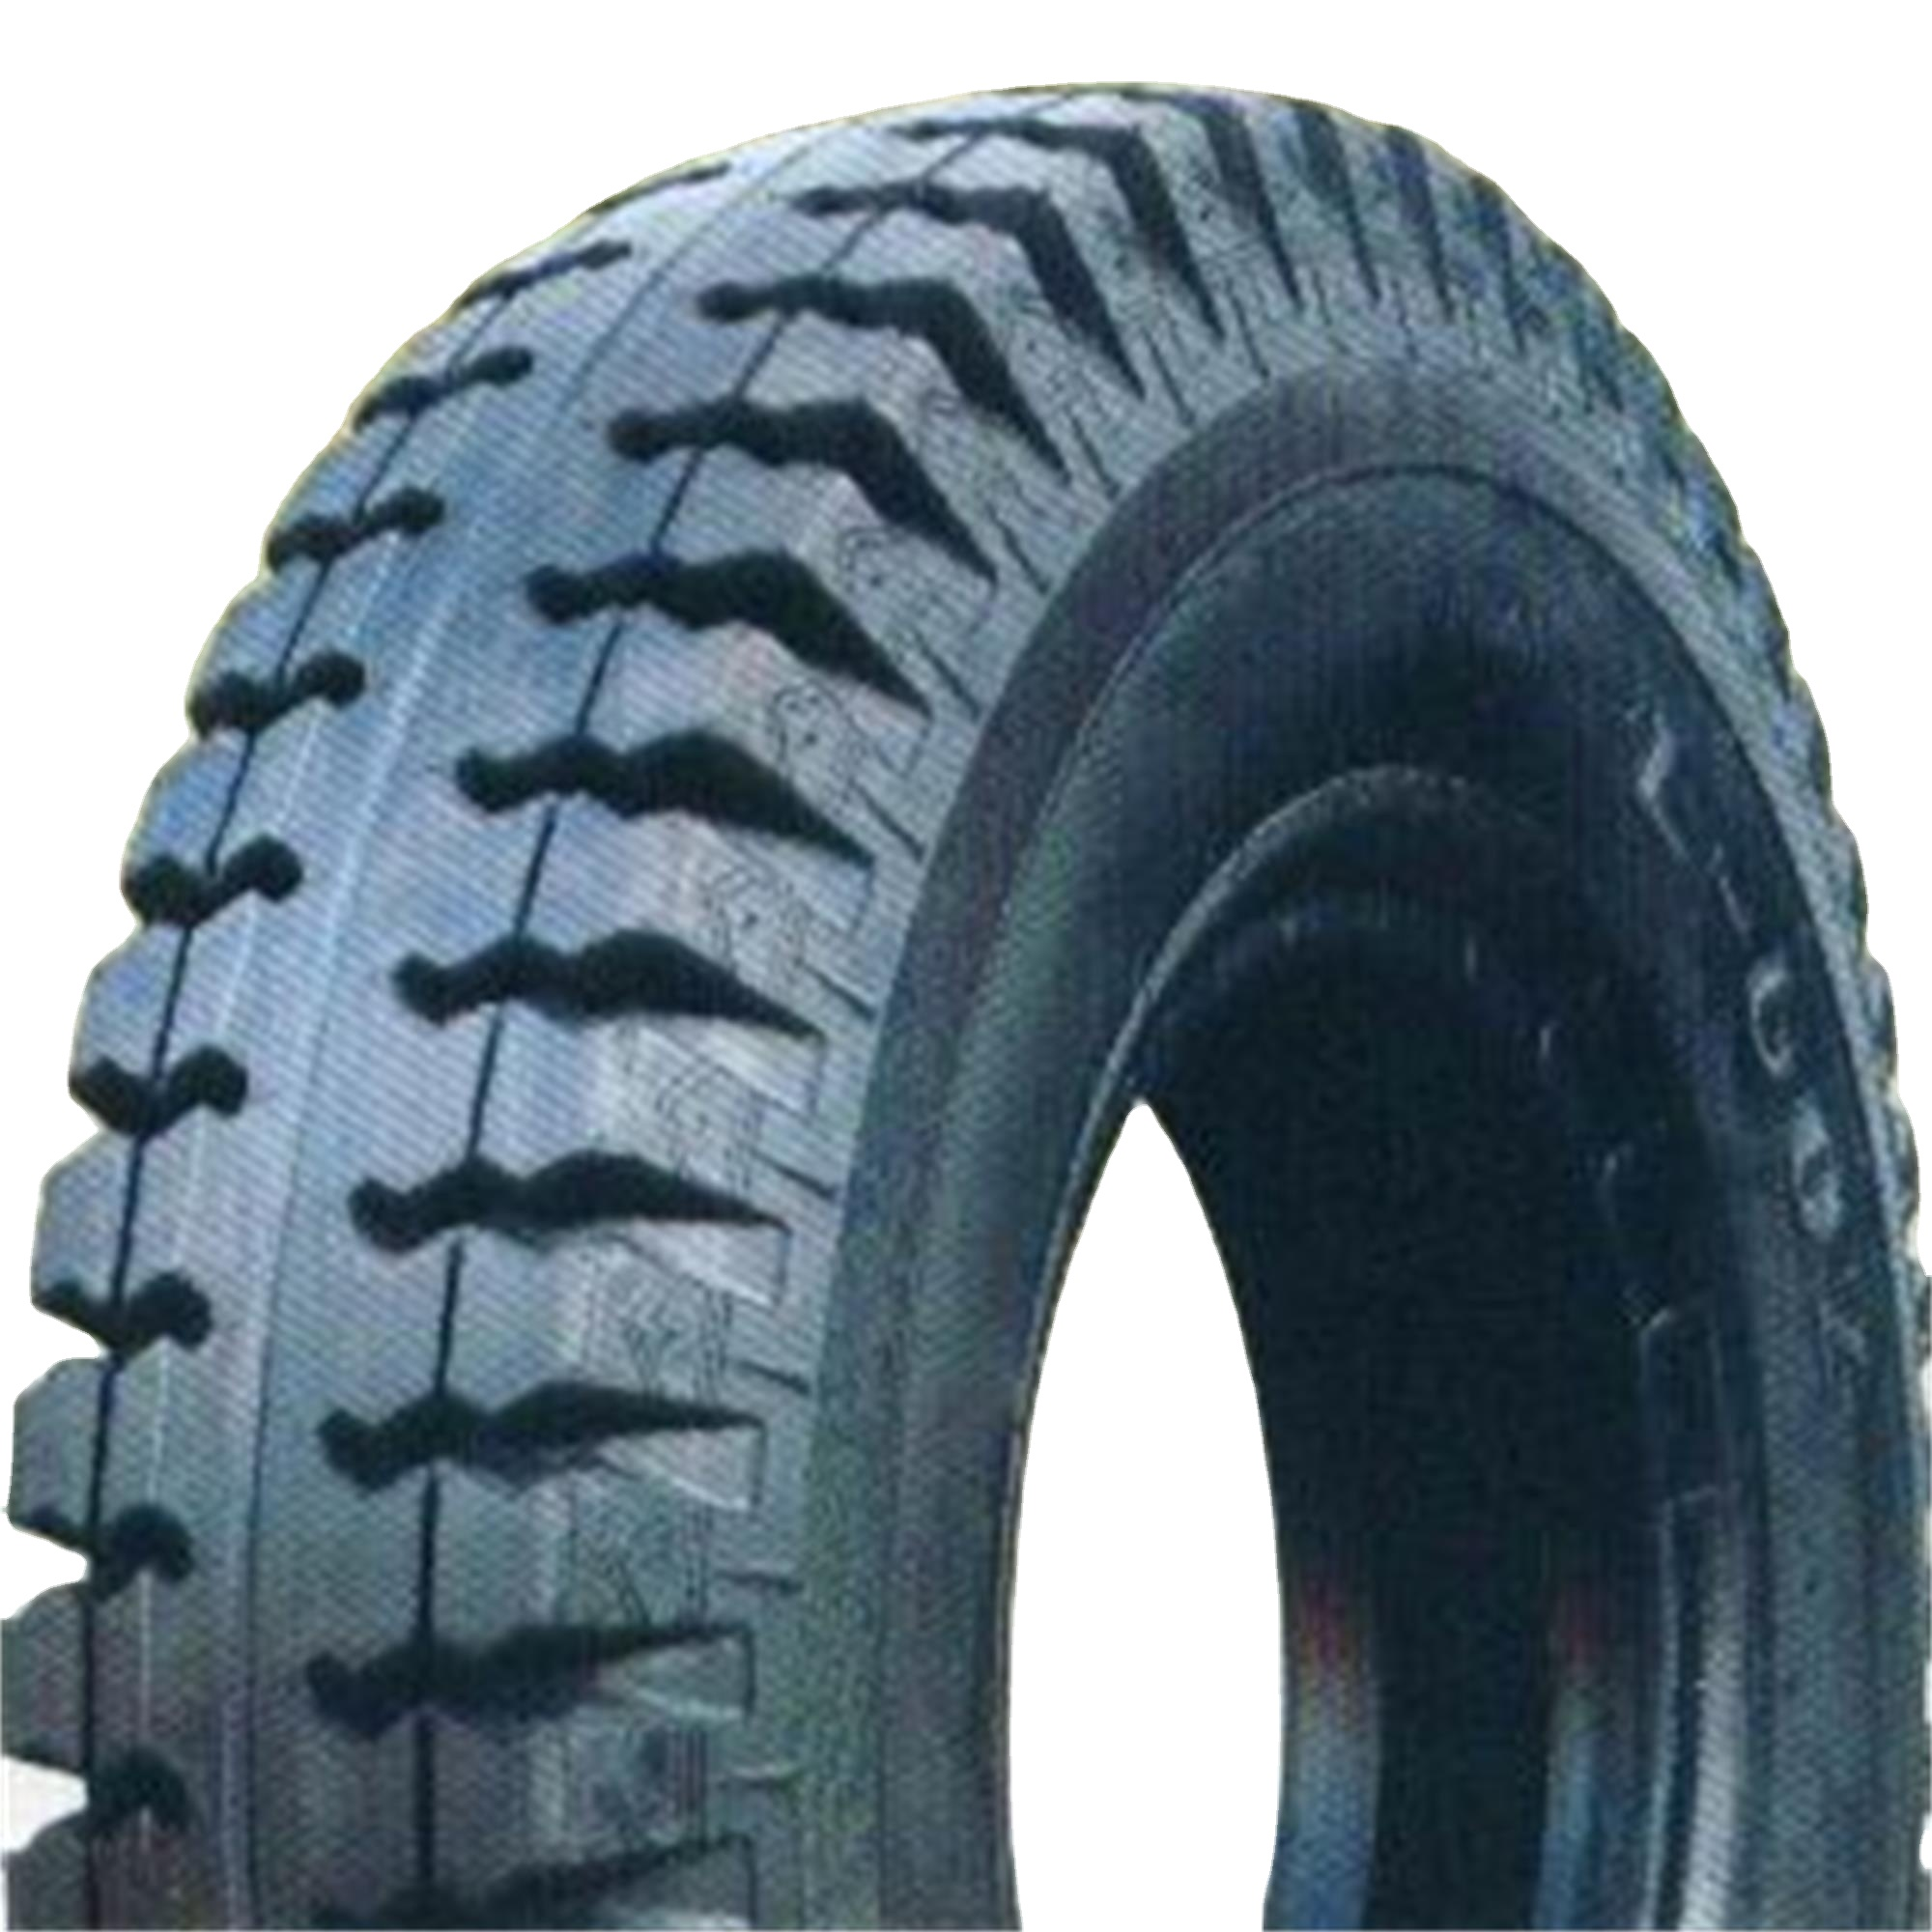 Hot Selling High Quality Heavy Loading Bias Light Truck Tyre Tbb Tires Nylon 7.50-16-16PR